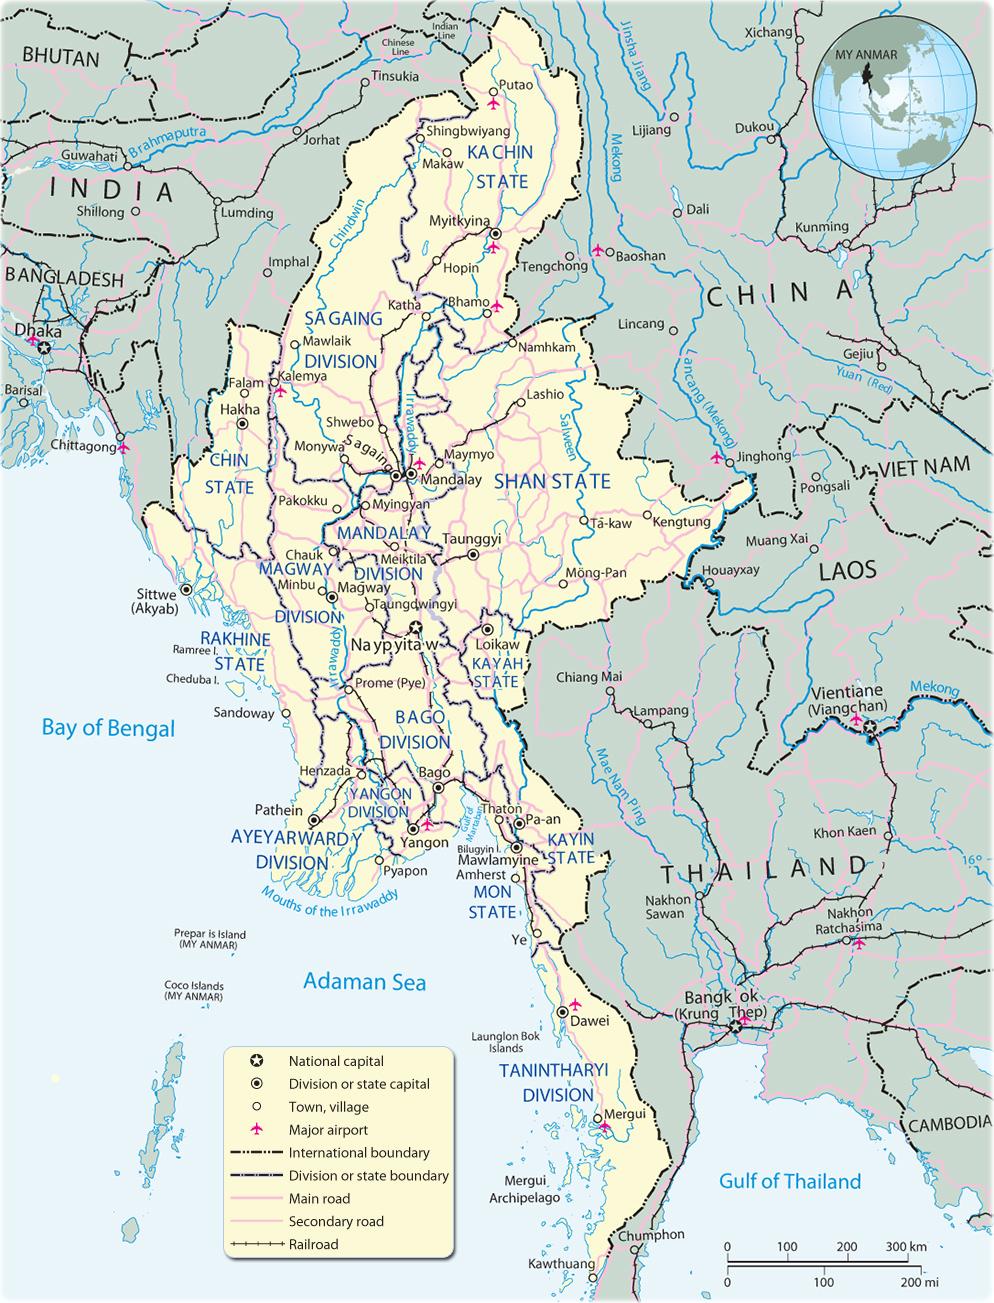 Map of Myanmar - Yangon - Asia Yangon Map on vientiane map, burma map, taiohae map, hanoi map, hong kong map, bumthang map, phnom penh, ho chi minh city, manila map, rangoon map, mekong river map, siem reap, jakarta map, islamabad map, bandar seri begawan map, great wall of china map, bangkok map, kuala lumpur, murang'a map, aung san suu kyi, burmese language, kuala lumpur map, taipei map, yangtze river map, naypyidaw map, myanmar map,